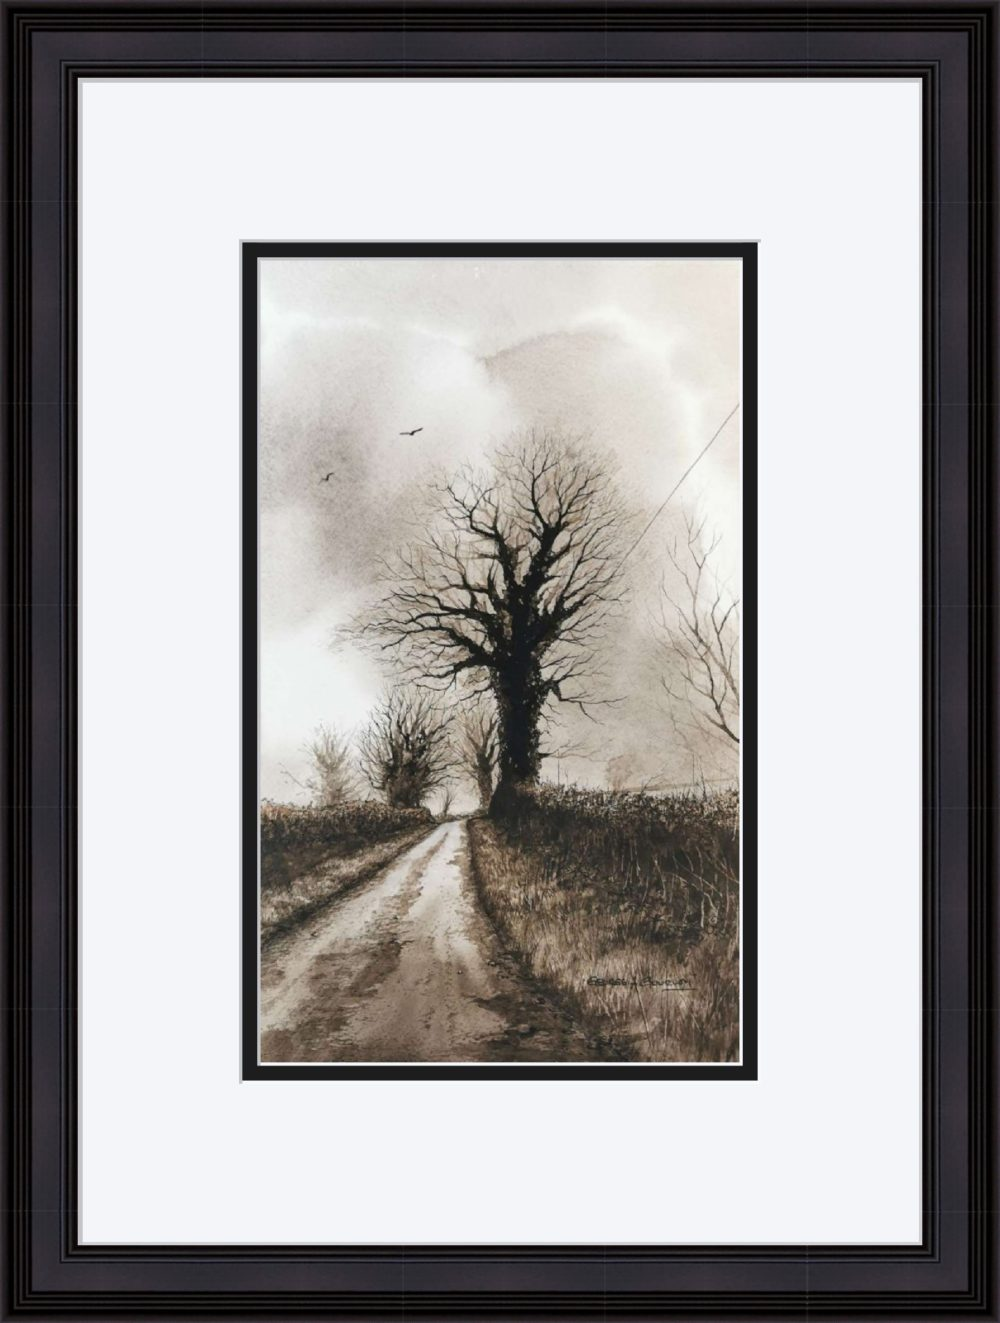 Up The Lane in Black Frame